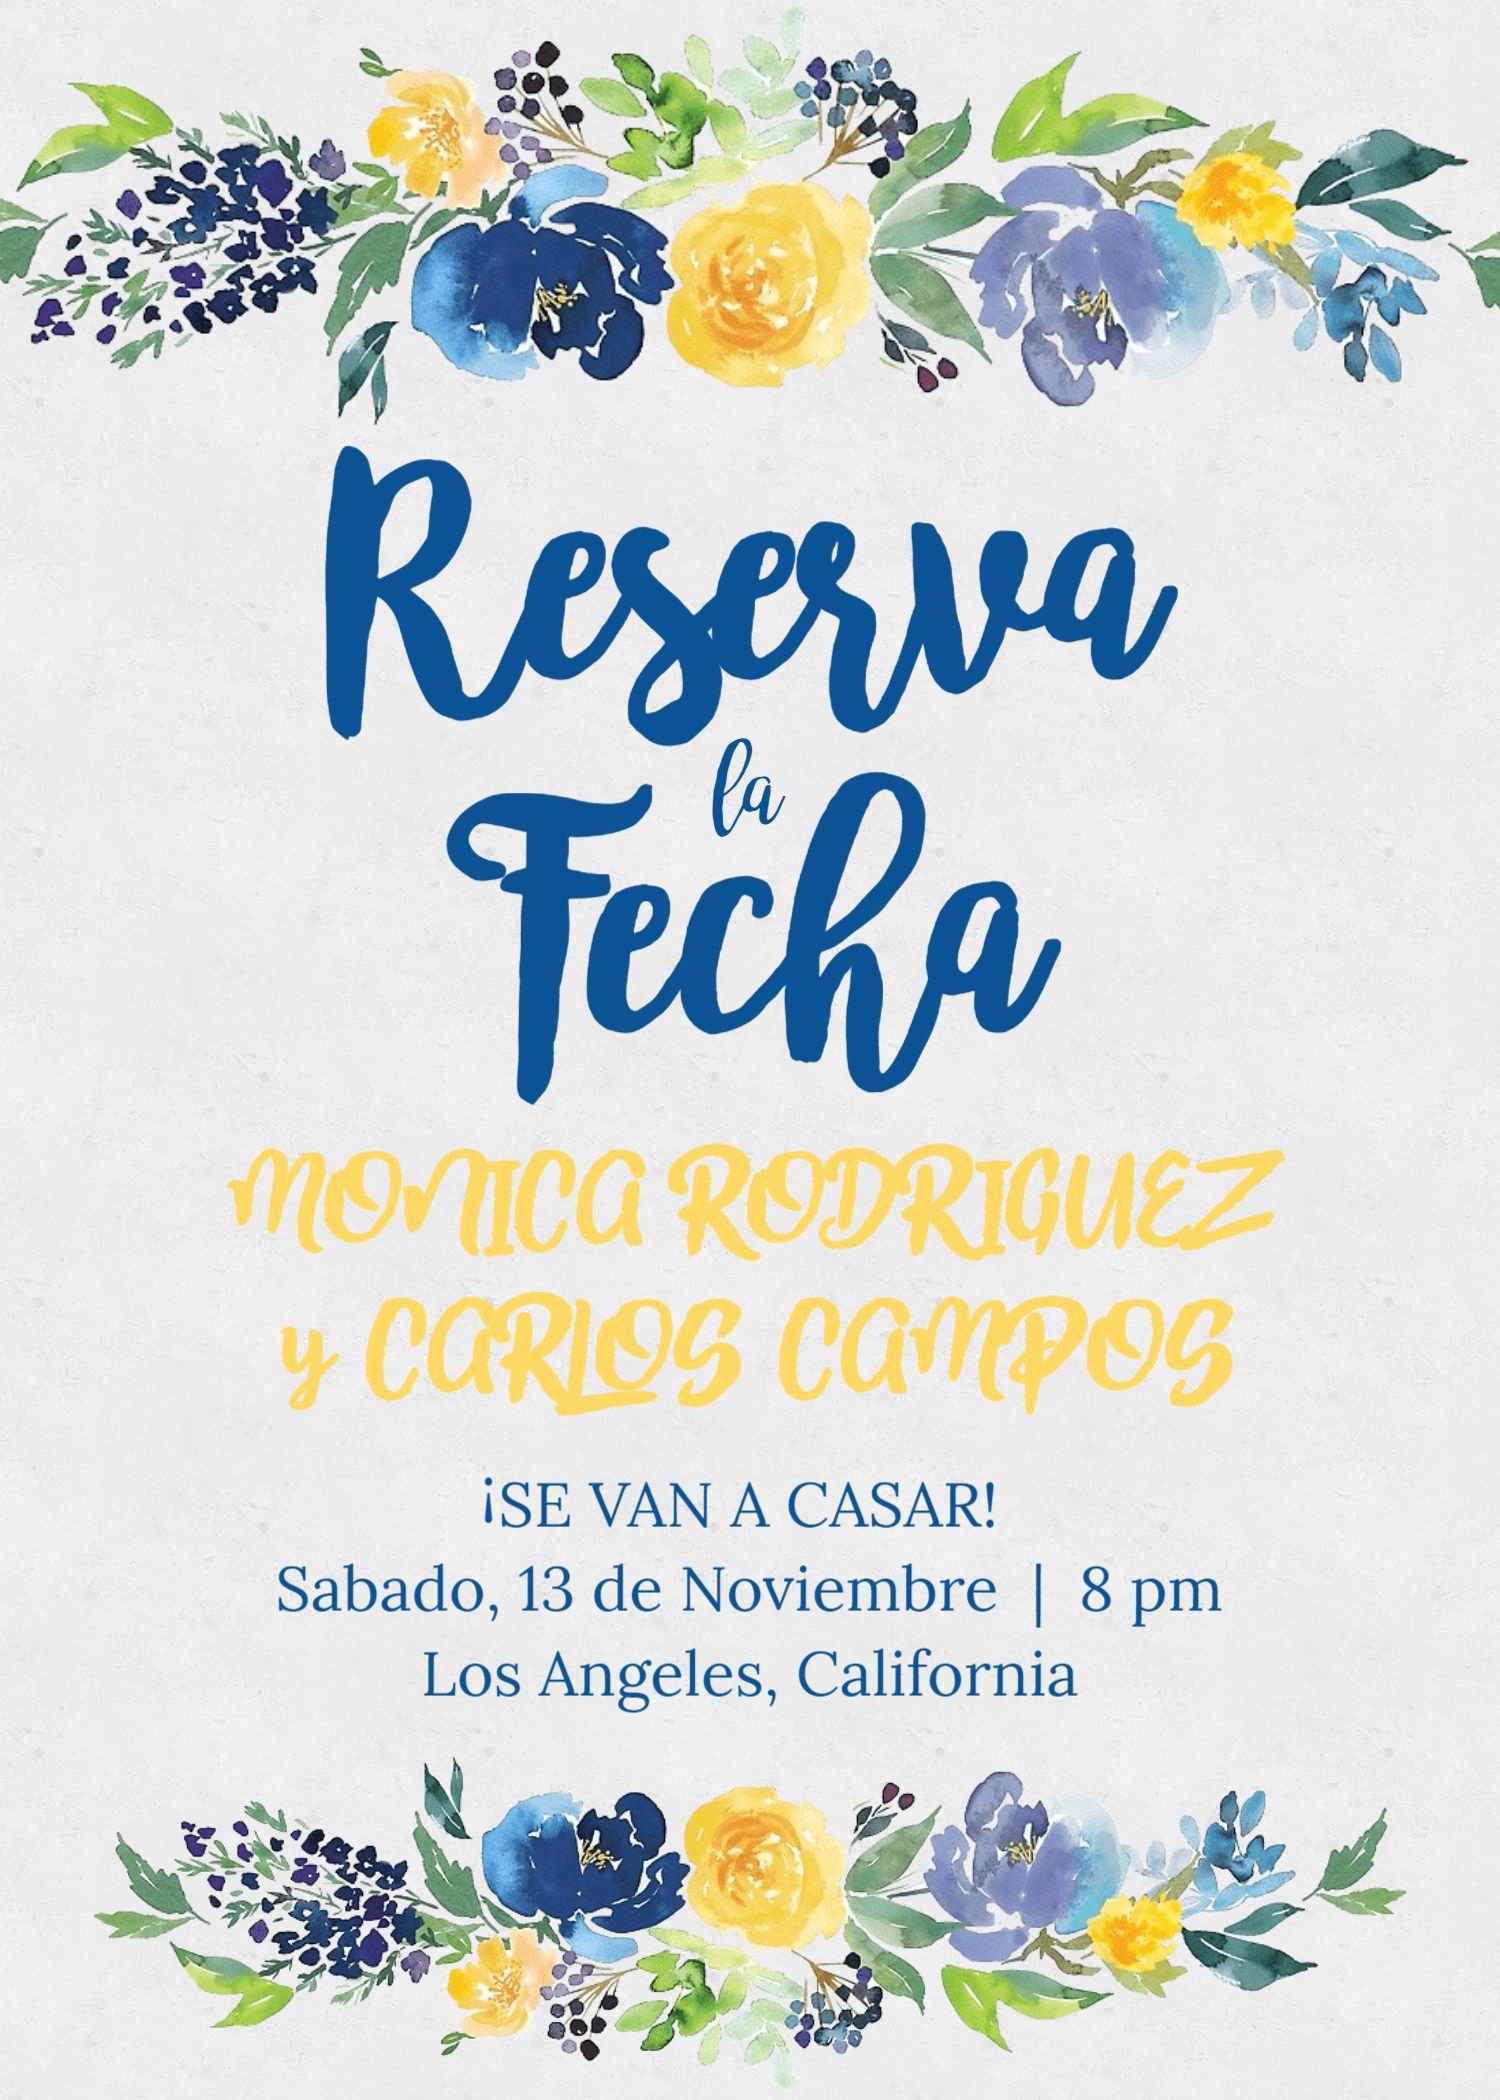 save date reserva la fecha spanish wedding español invitacion